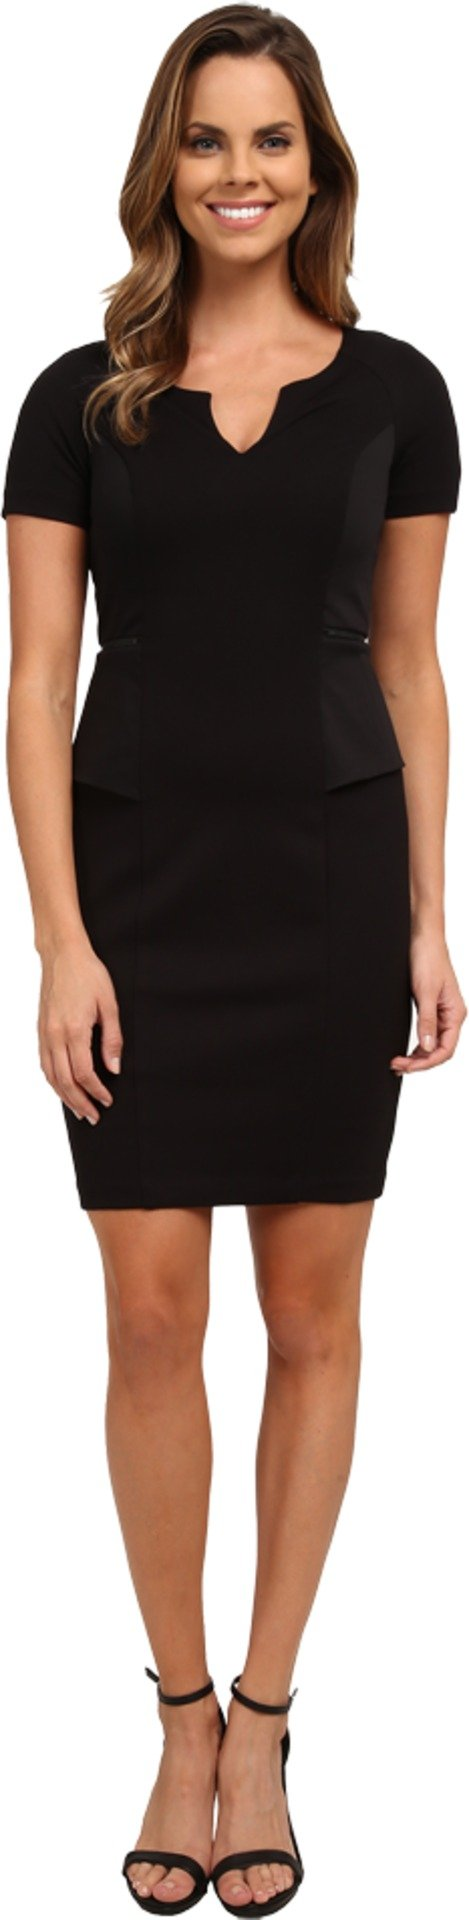 NYDJ Women's Bridget Peplum Ponte Dress, Black, 8